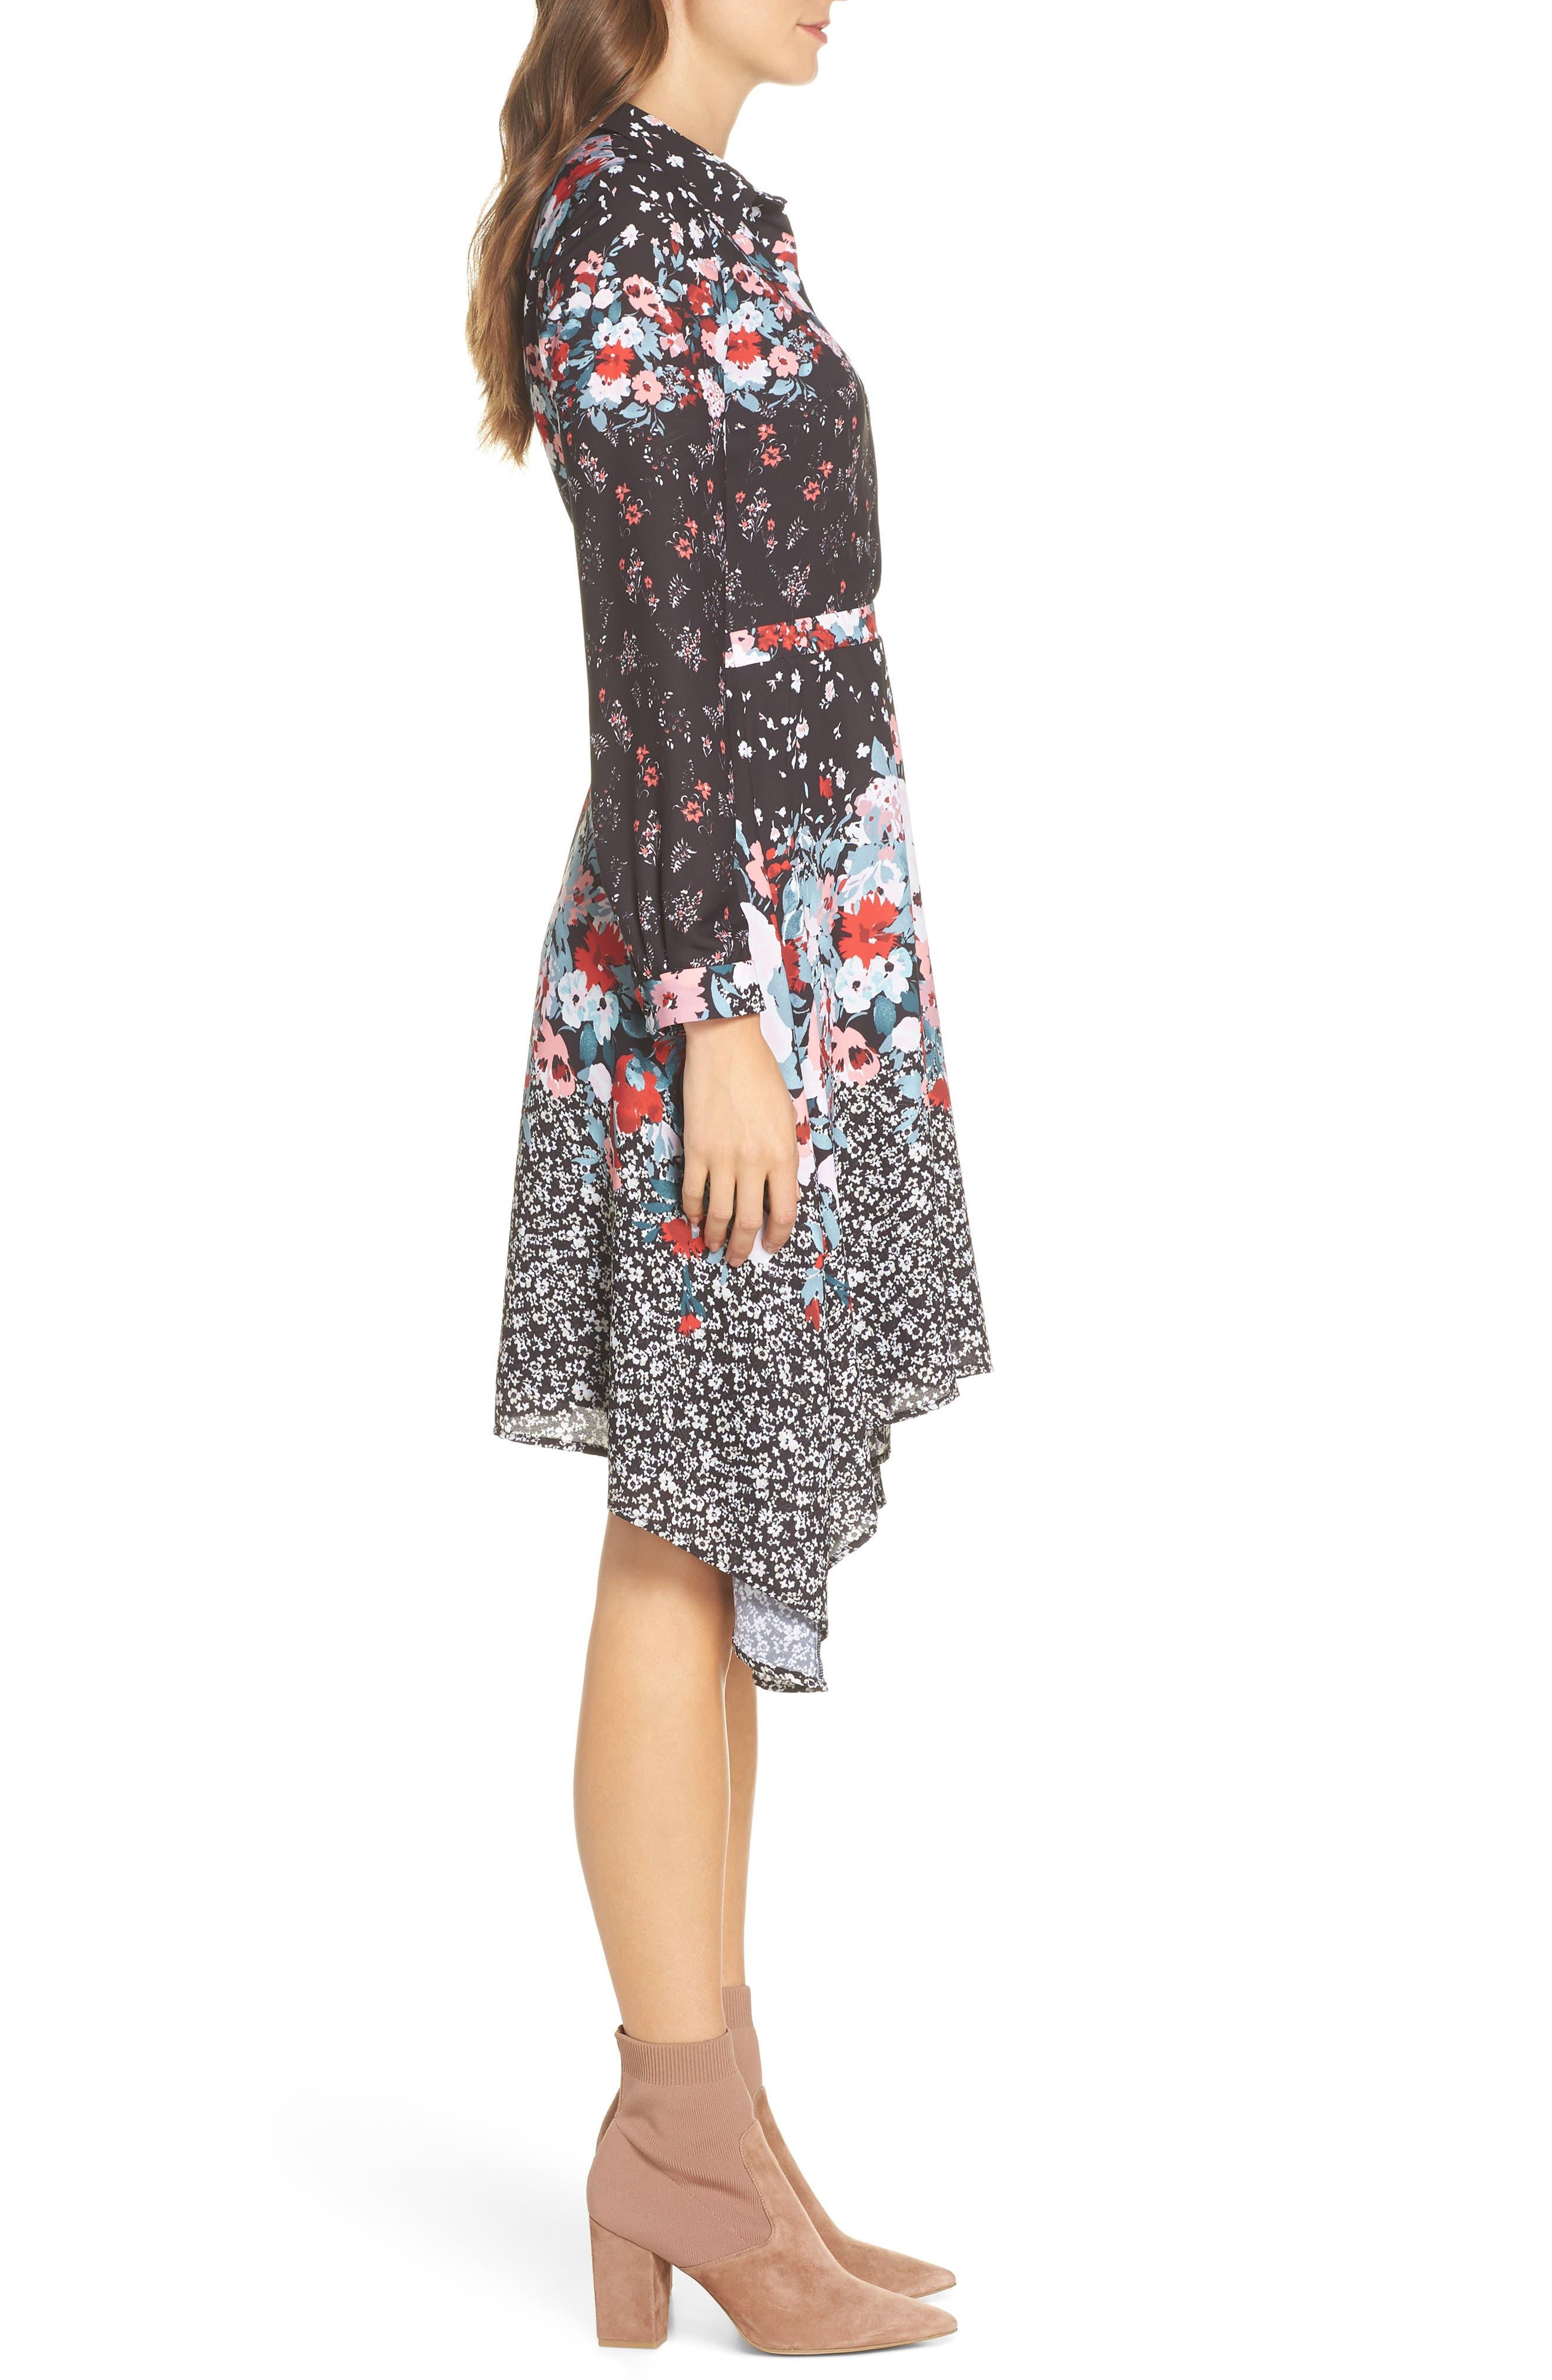 JULIA JORDAN, Floral Print Shirtdress, Alternate thumbnail 4, color, 017